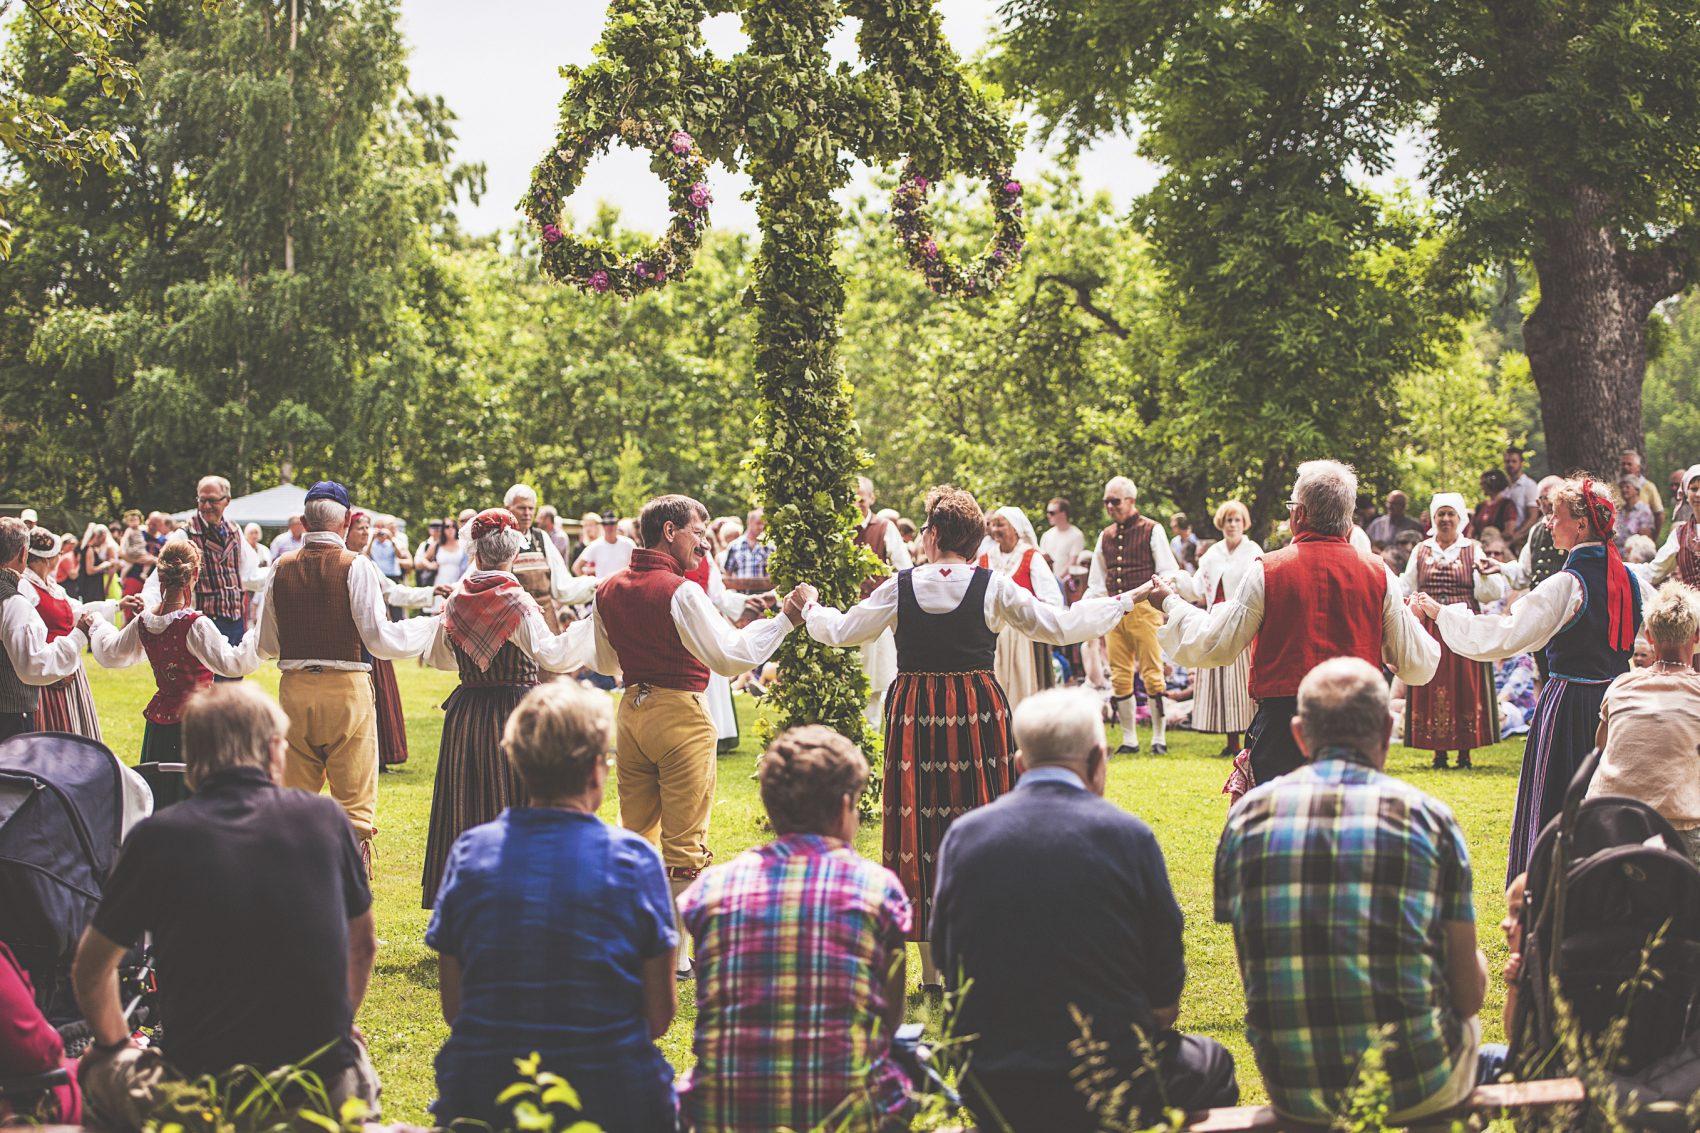 Swedish midsummer solstice